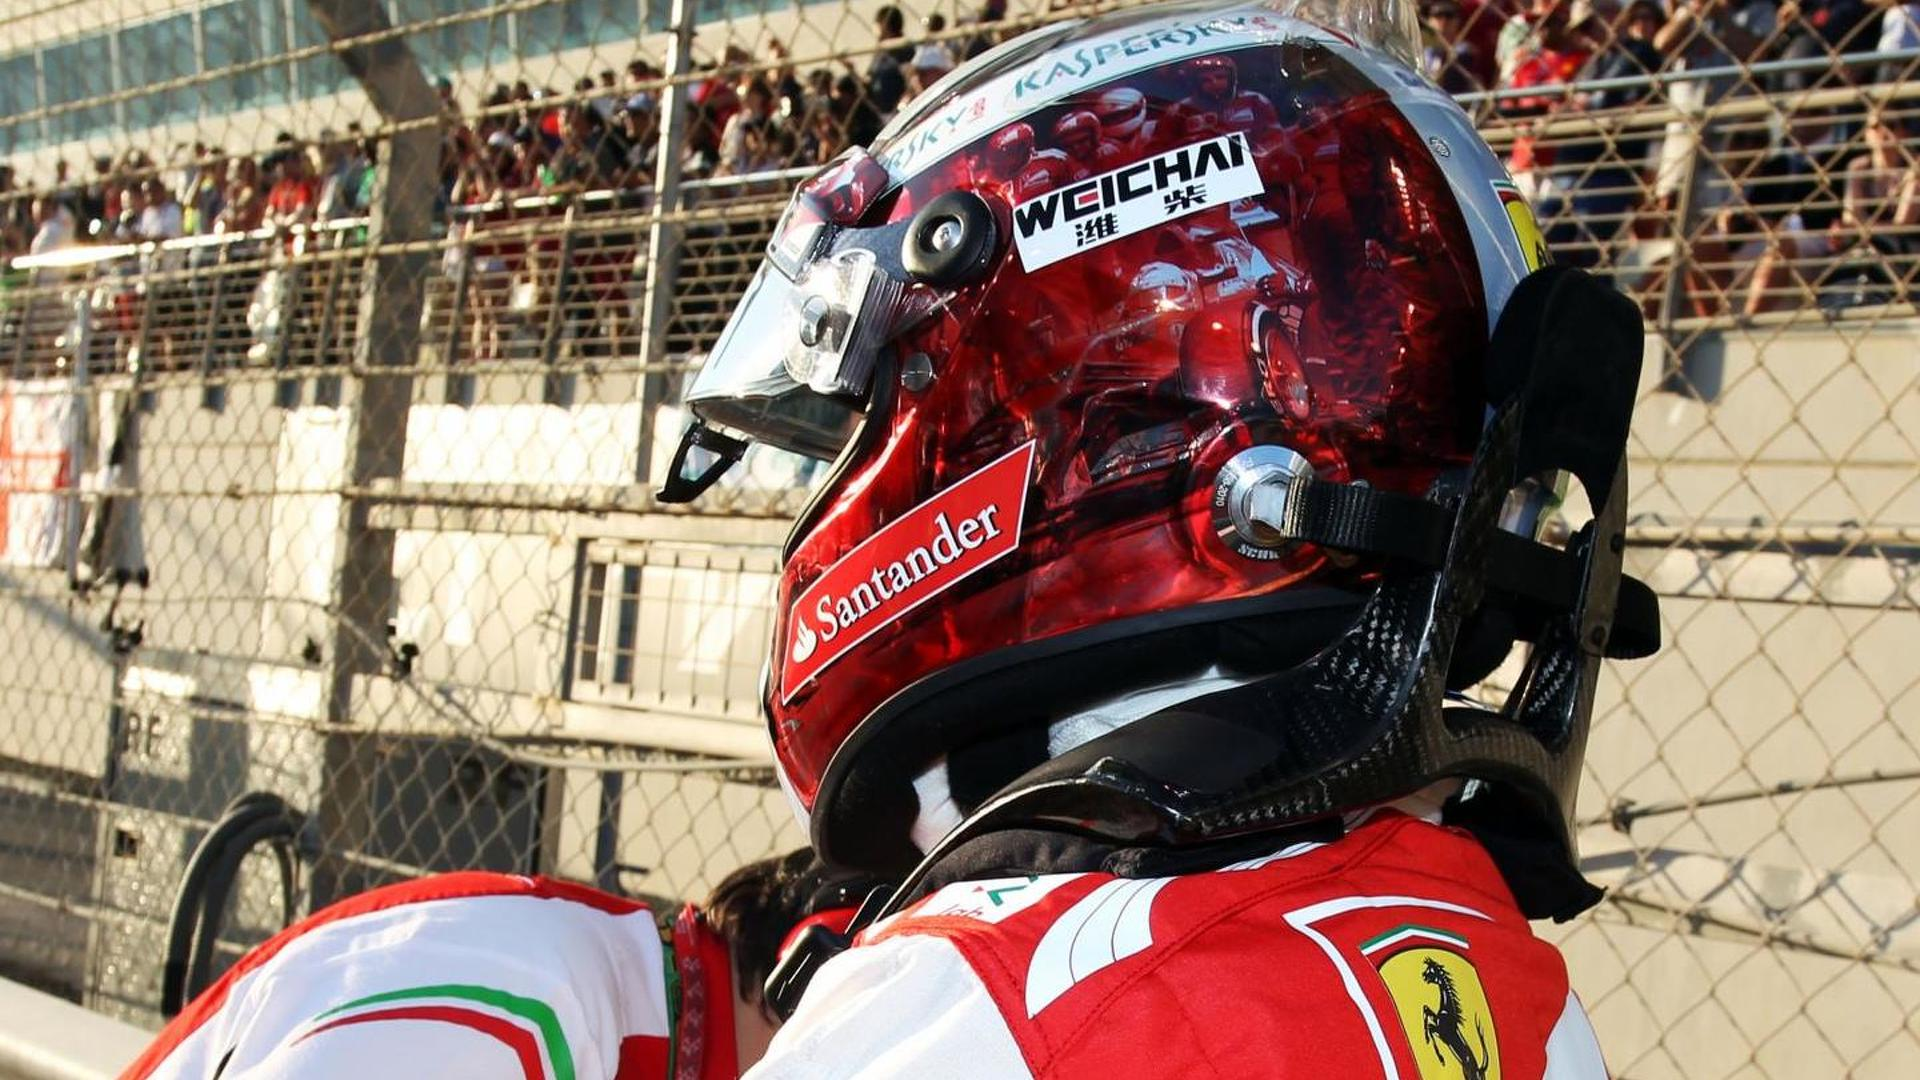 No 'explosion' as Alonso's Ferrari tenure ended - Briatore